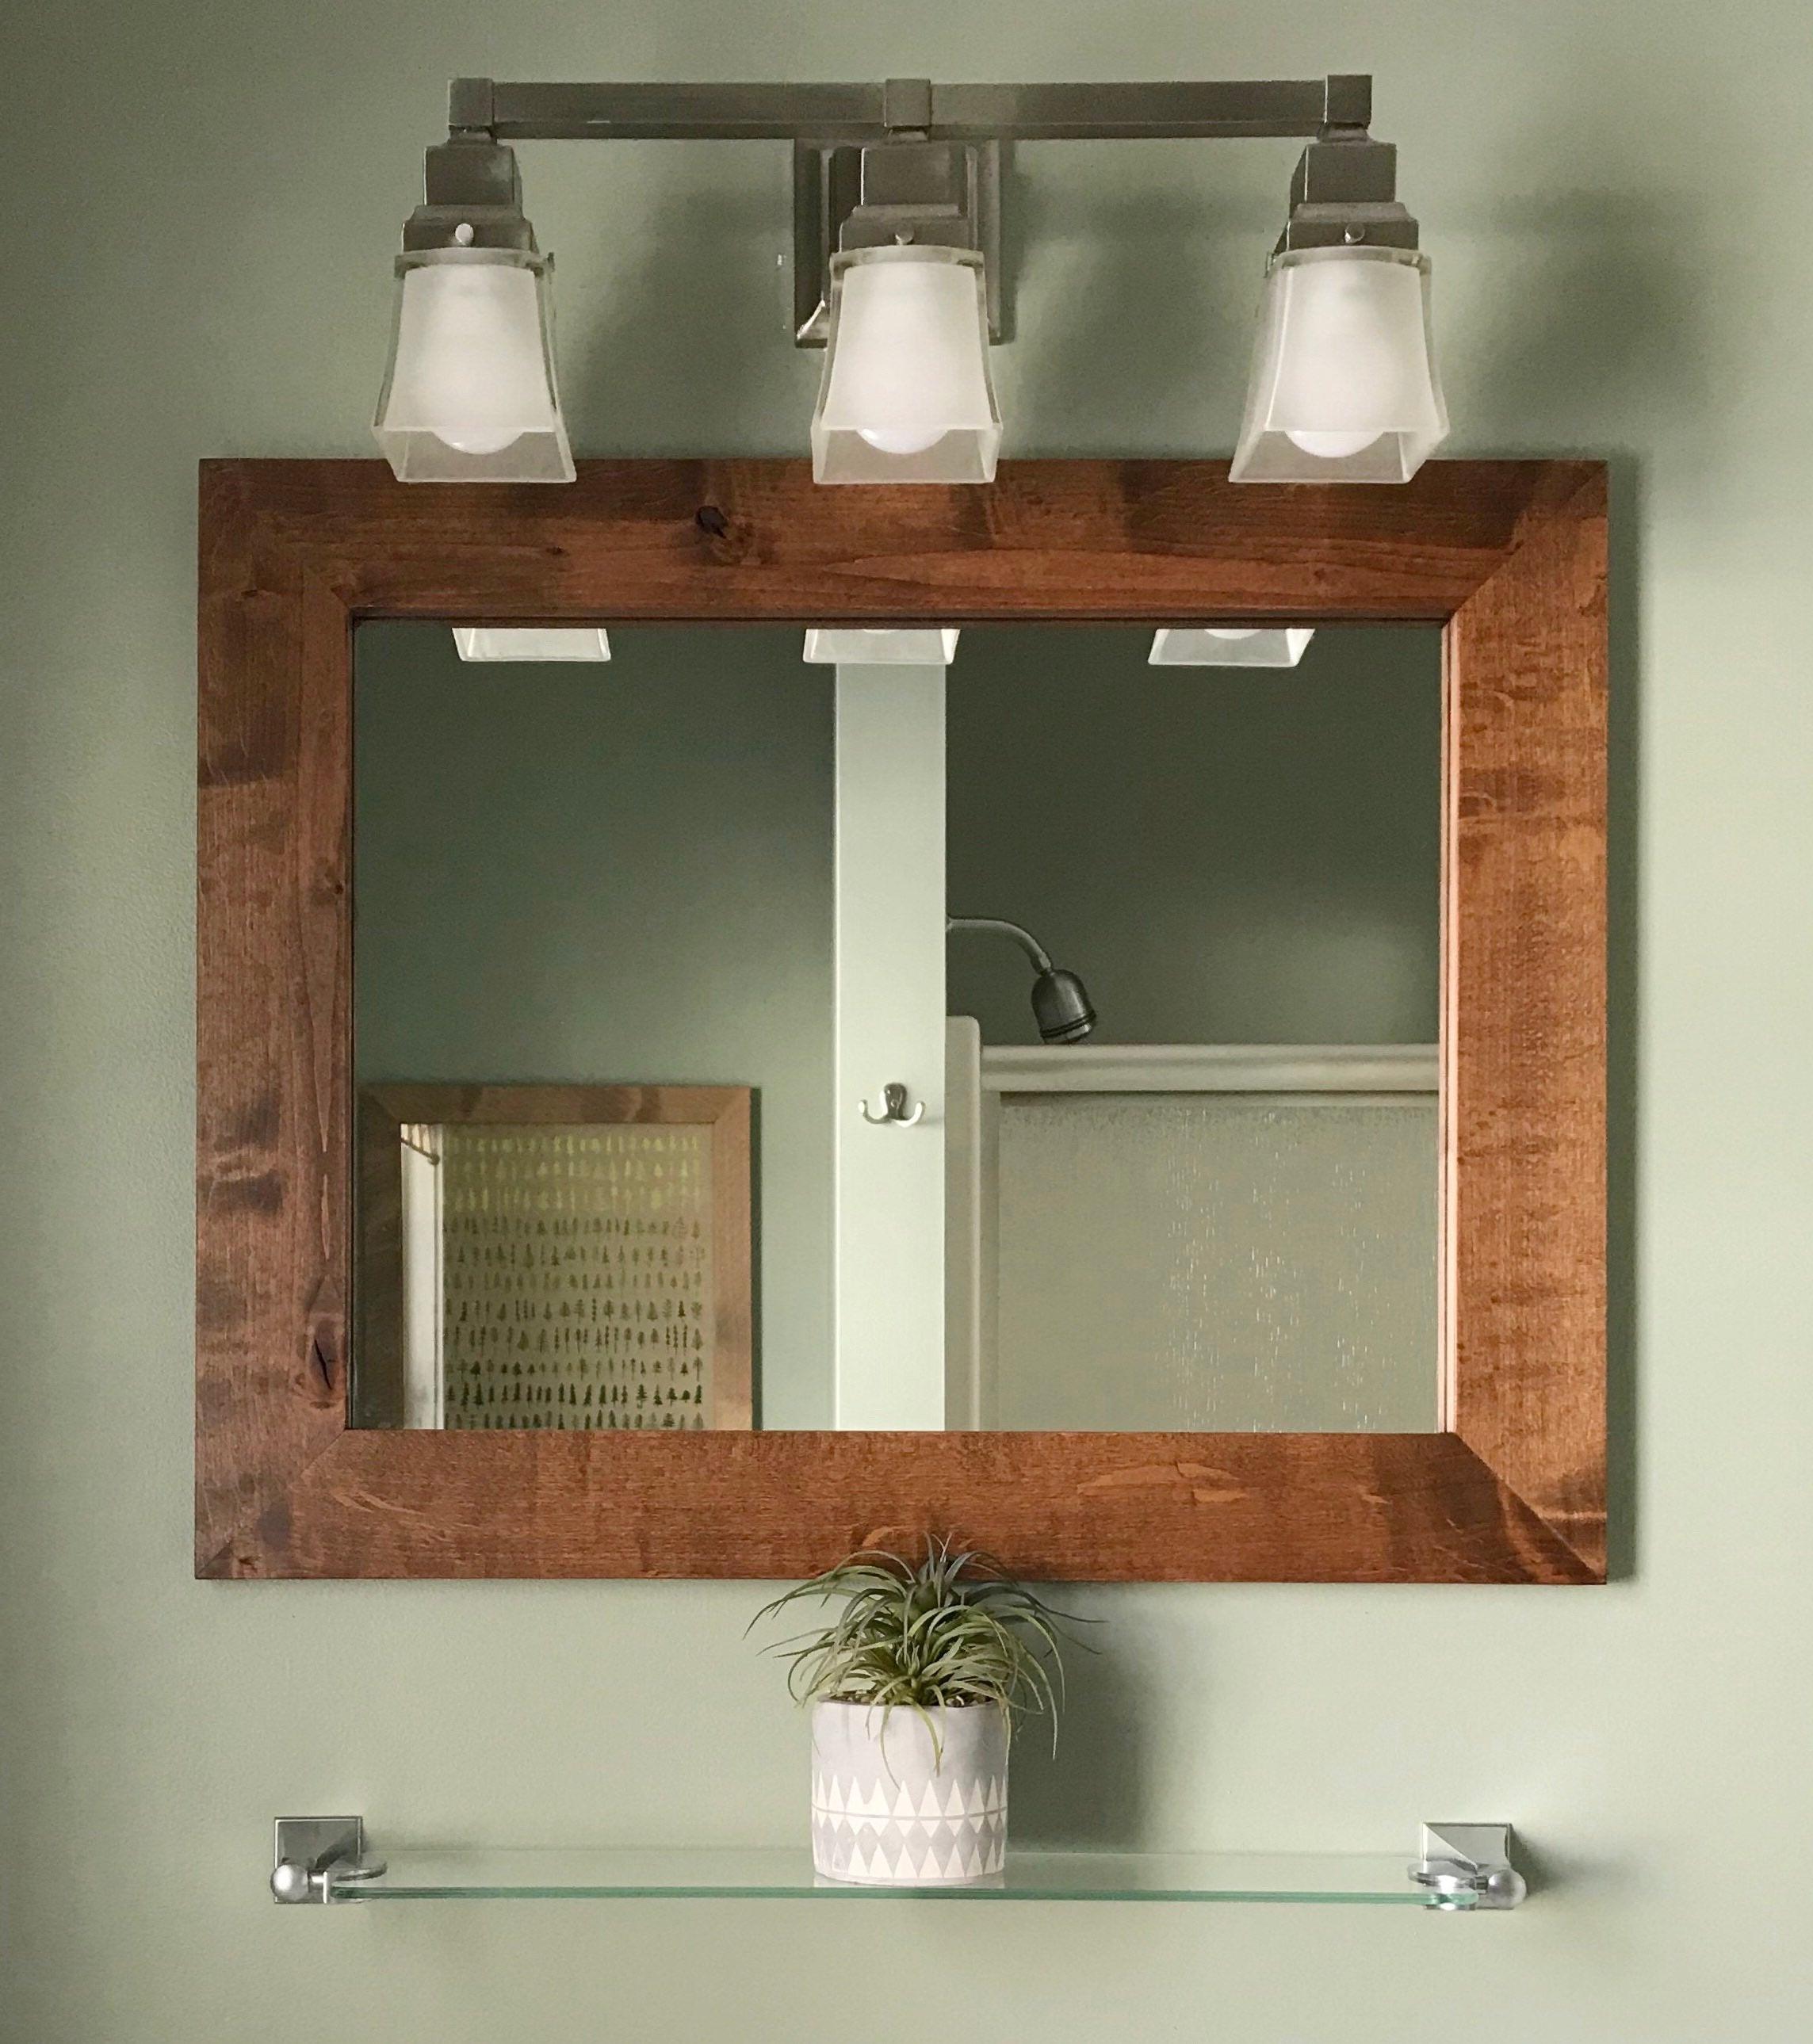 Vanity Mirrors With Regard To Best And Newest Vanity Mirror // Contemporary Rustic Vanity Mirror // Wooden Vanity Mirror // Contemporary Mirror // Framed Mirror // Bathroom Vanity Mirror (View 16 of 20)